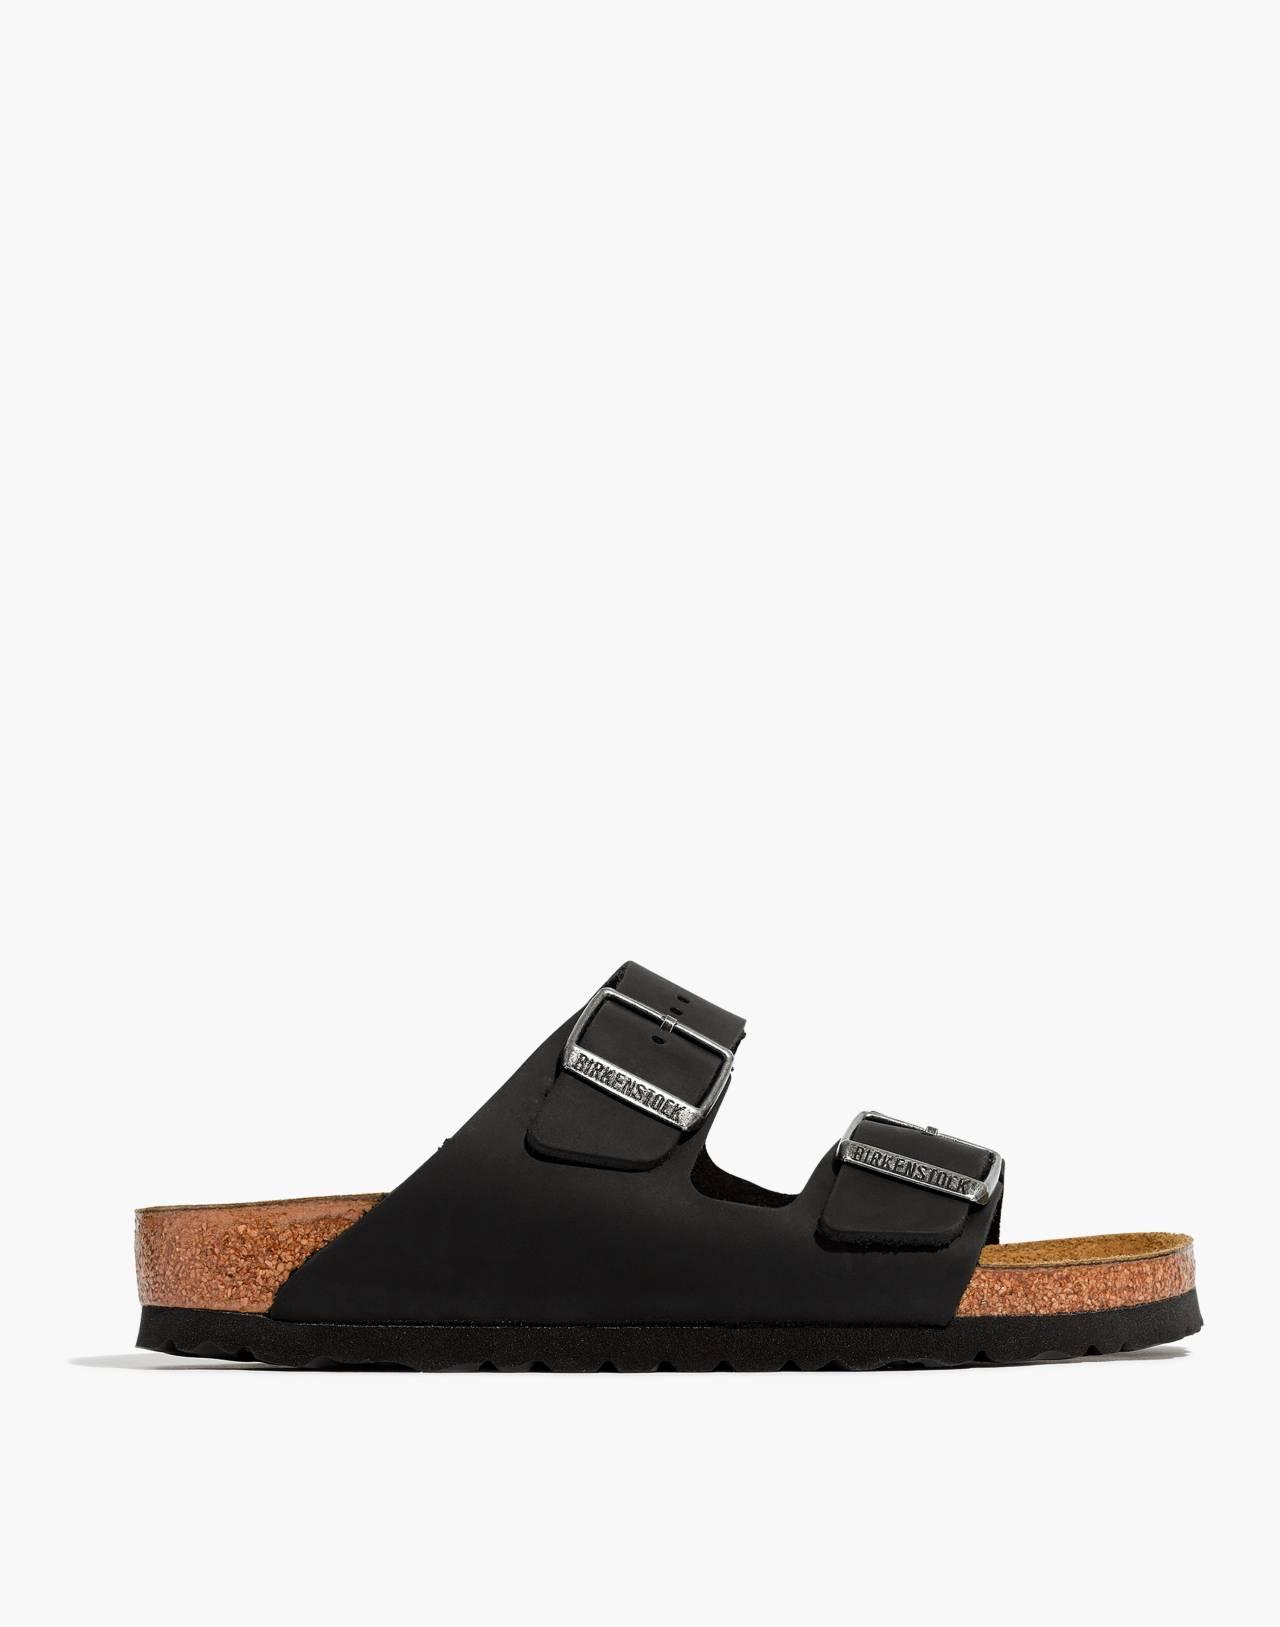 Birkenstock® Arizona Sandals in Black Leather in true black image 3